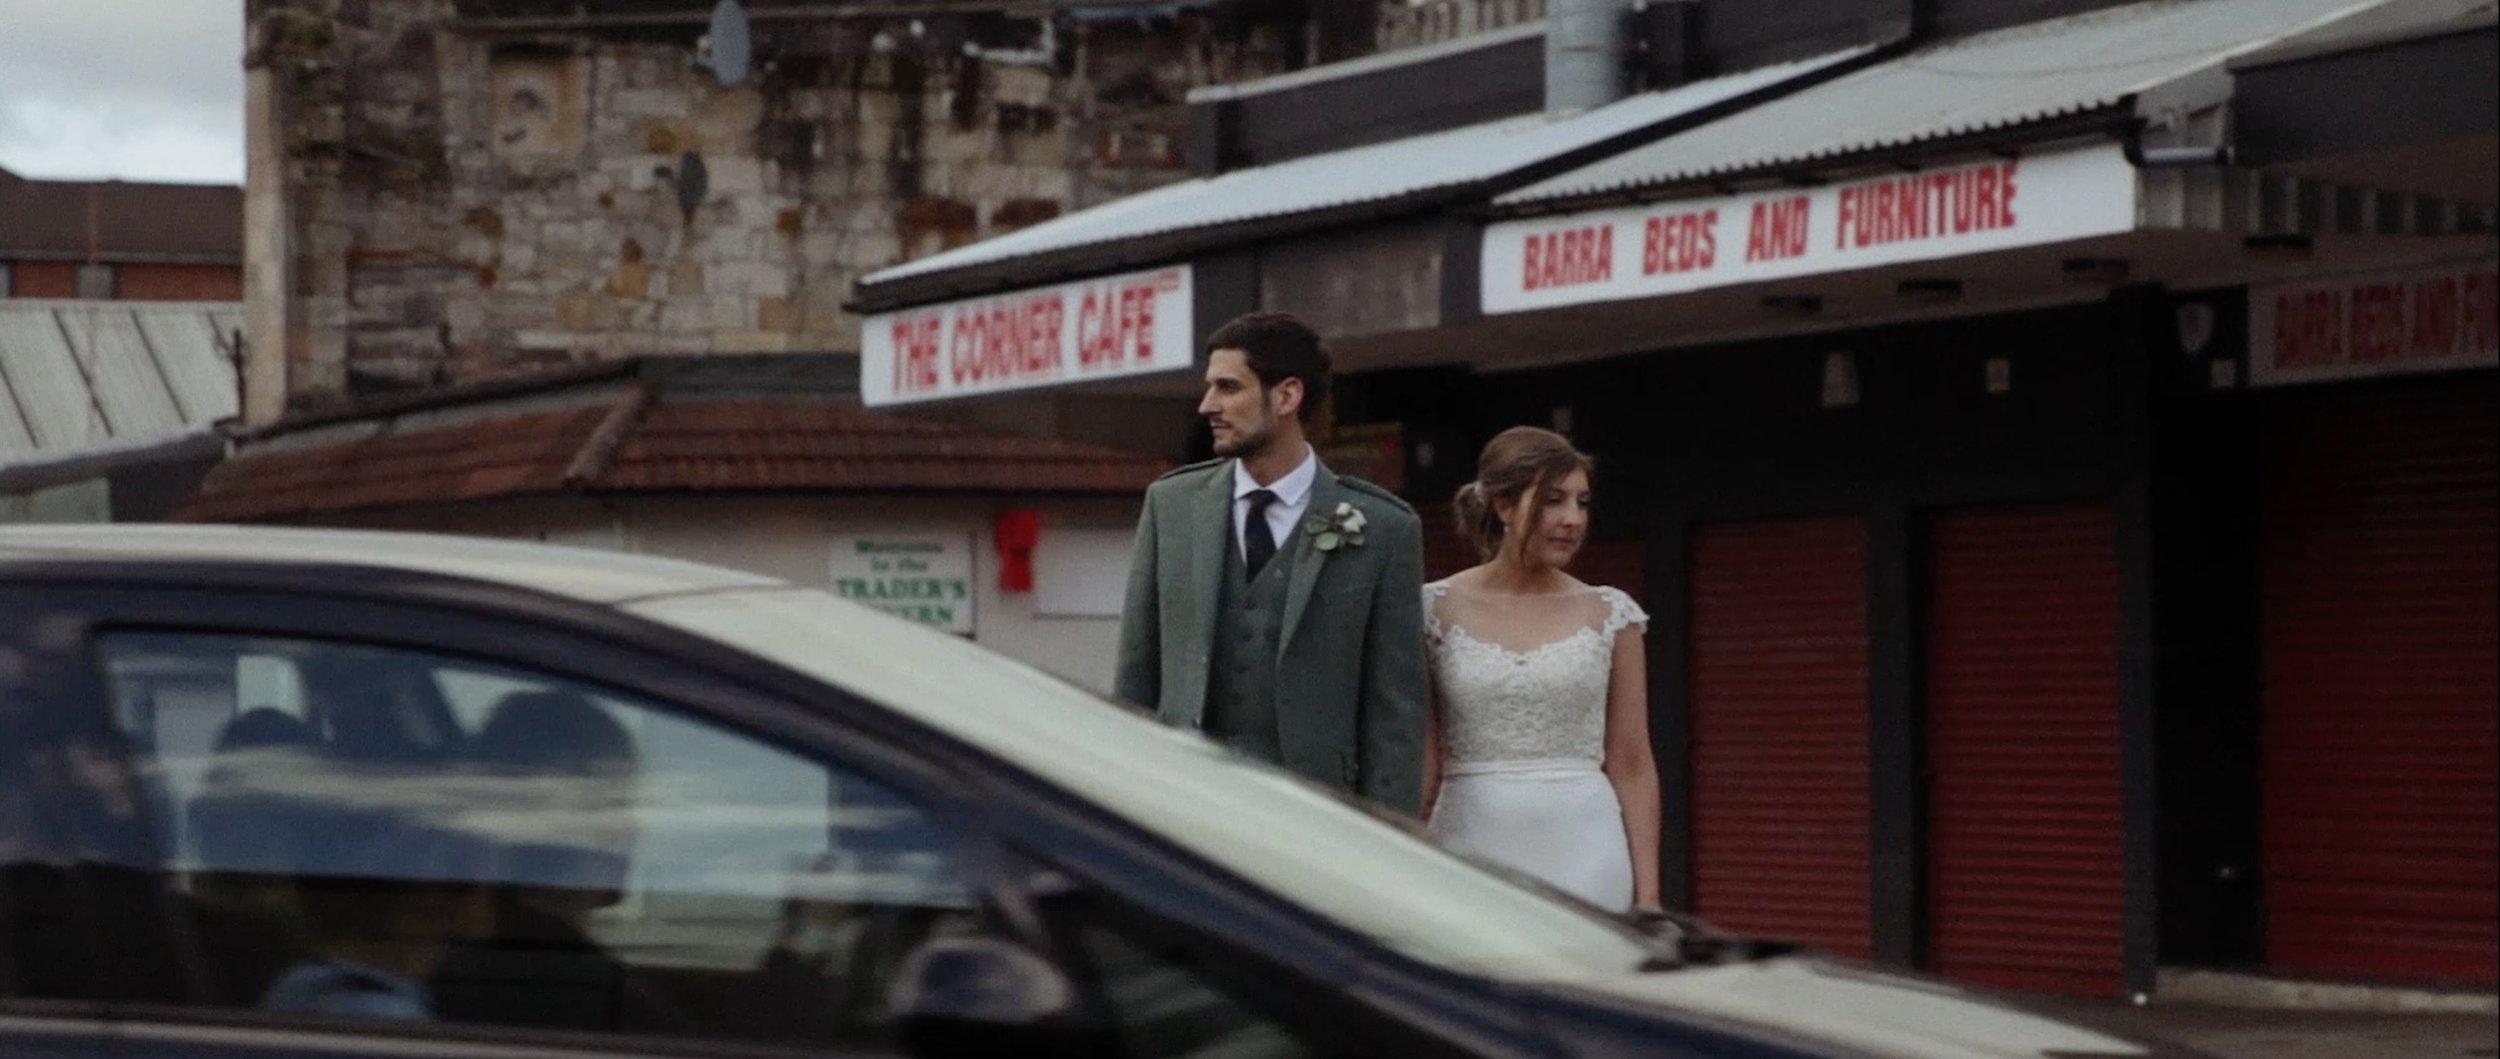 pollokshields-burgh-hall-wedding-videographer_LL_05.jpg